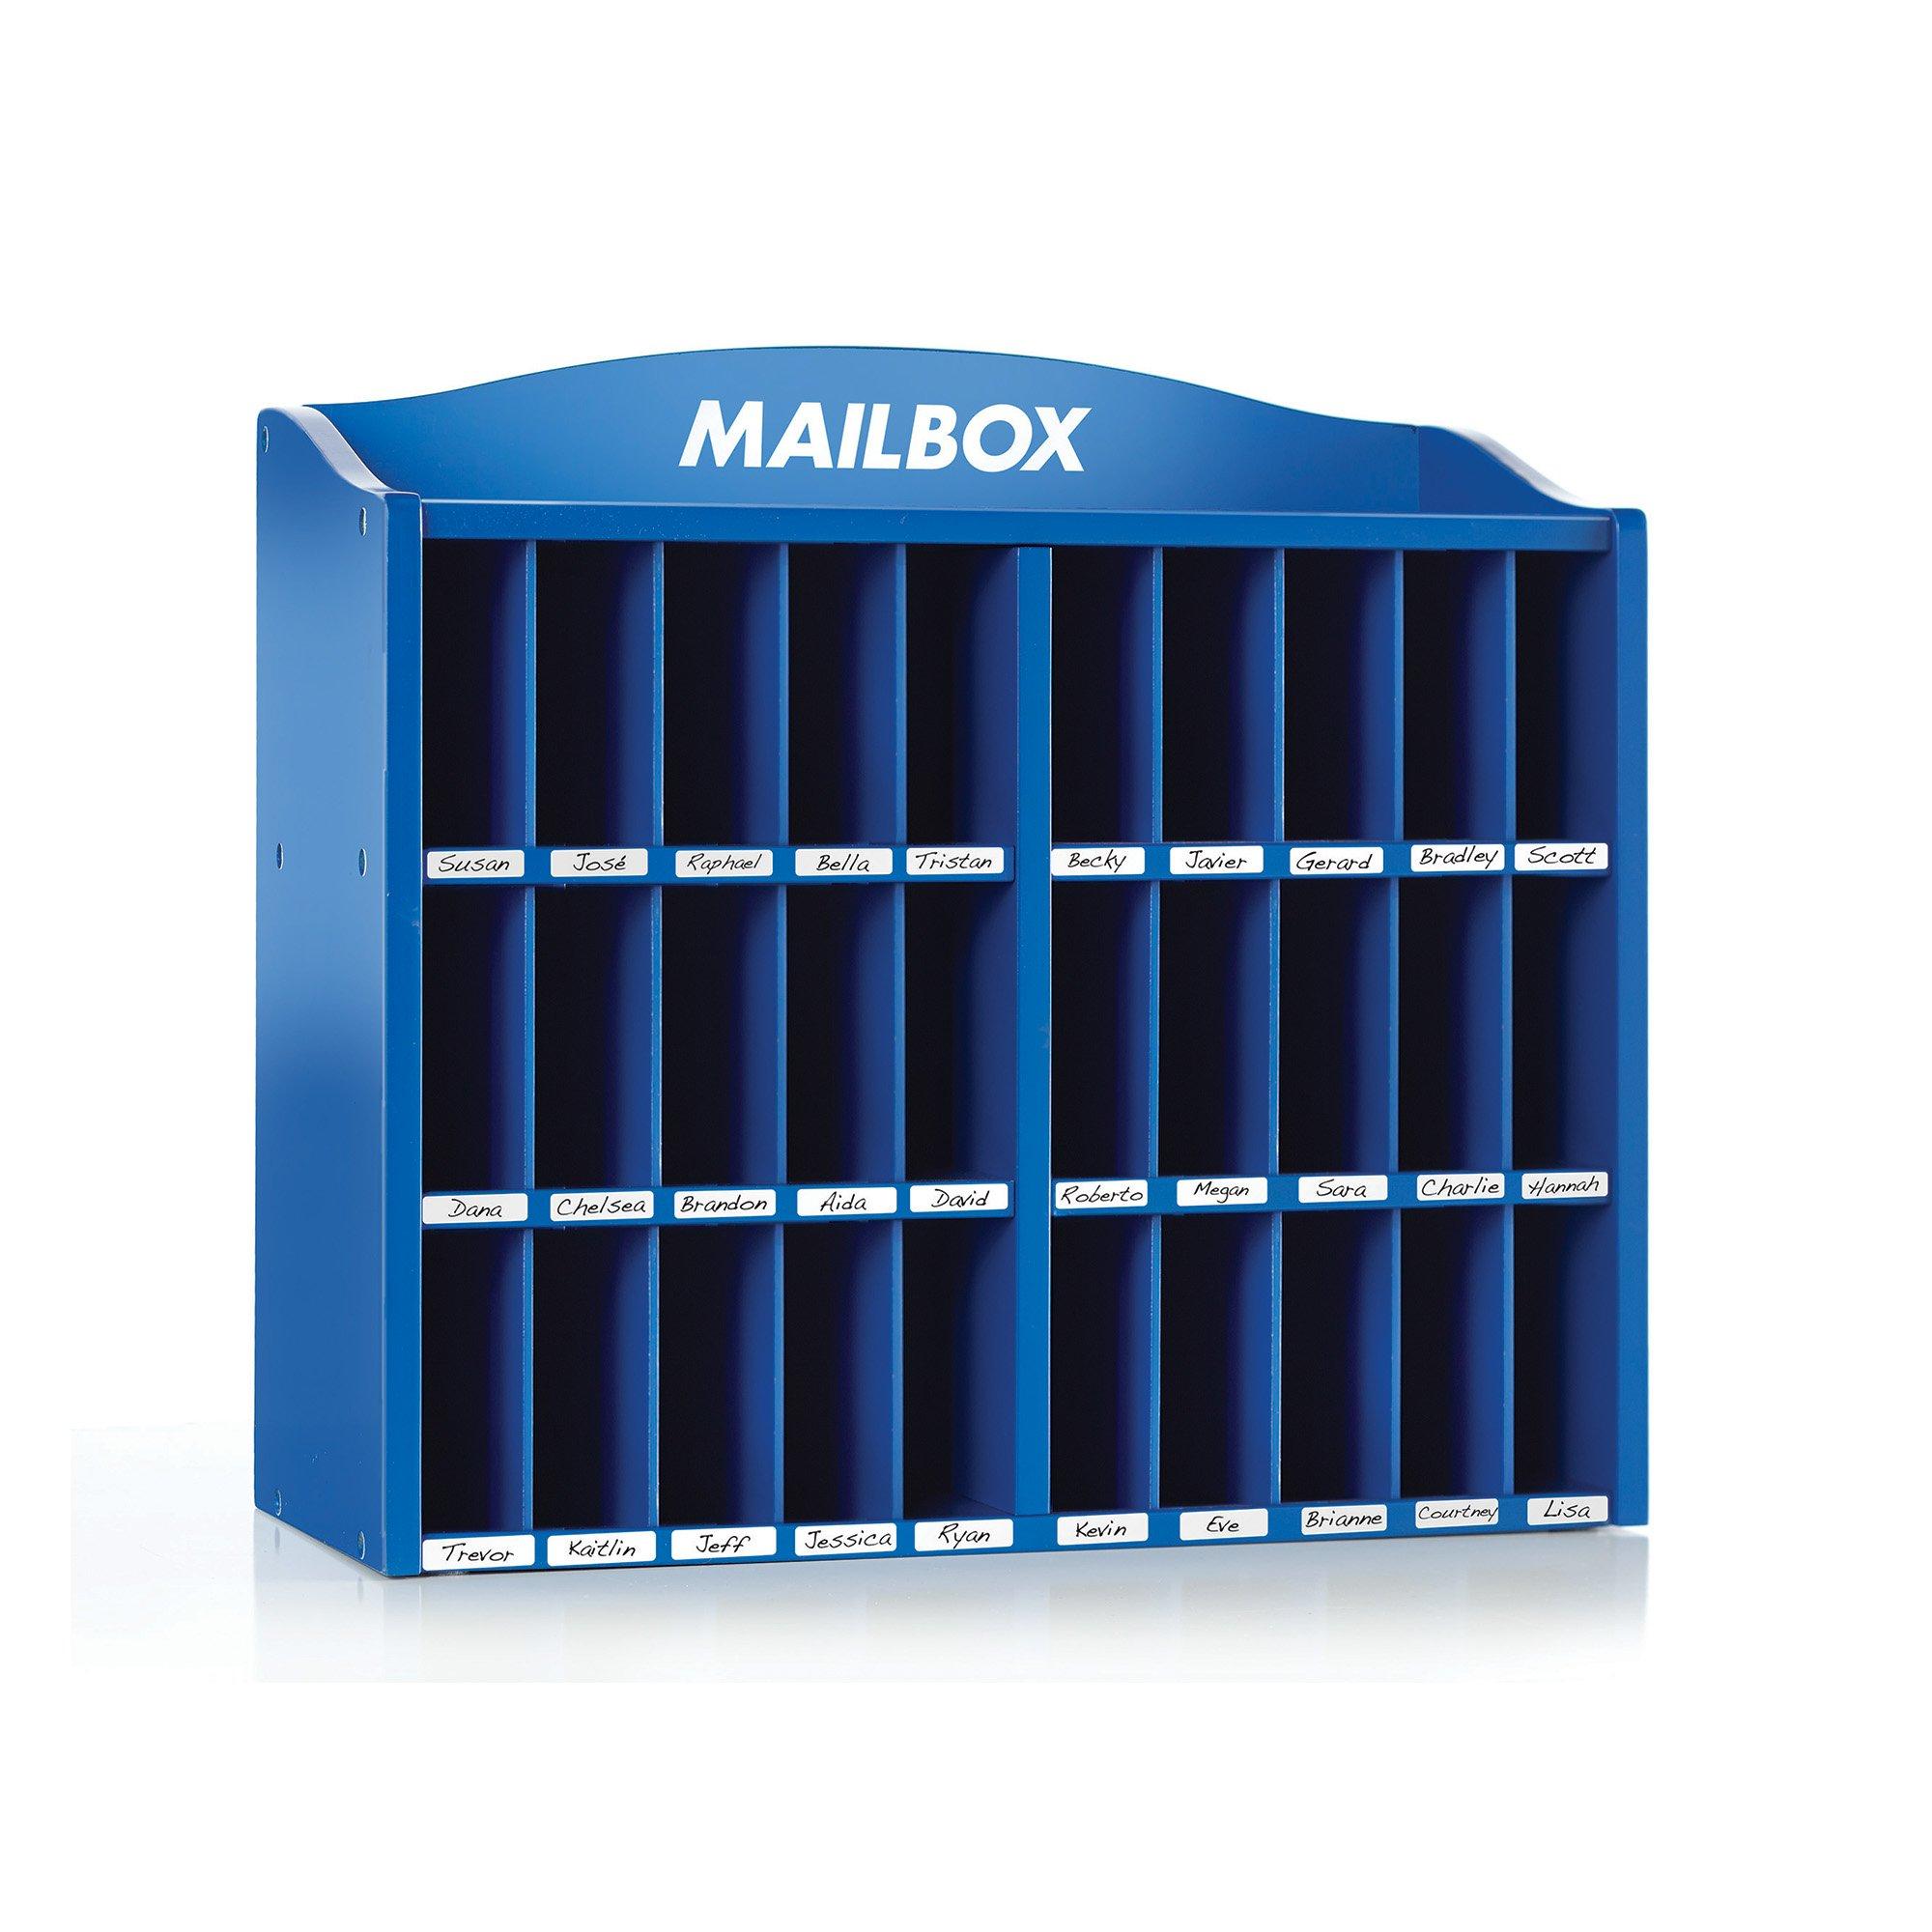 Guidecraft Preschool Classroom Mail Center - Classroom Organizer, 30 Compartment - Office School Supply Furniture